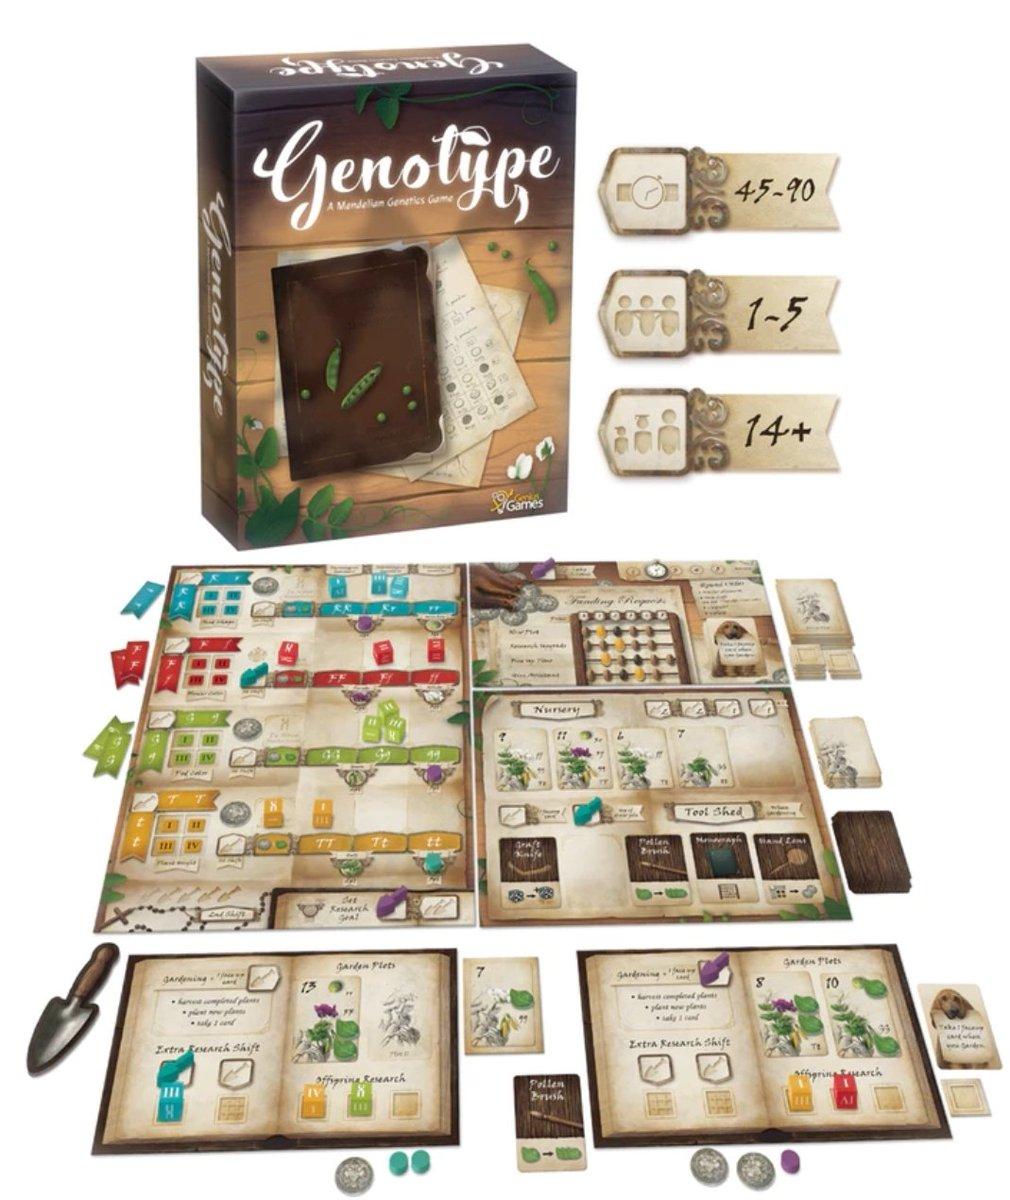 Genotype: A Mendelian Genetics Game, via @Kickstarter https://www.kickstarter.com/projects/geniusgames/genotype-a-mendelian-genetics-game?ref=android_project_share…  #leoeljugador #juegosdemesa #boardgames #tabletopgames #tabletopgaming #tabletopgame #kickstarter #boardgame #genotype  #geniusgames #genotypeboardgame #genotypekickstarterpic.twitter.com/0XxDq7ttGw